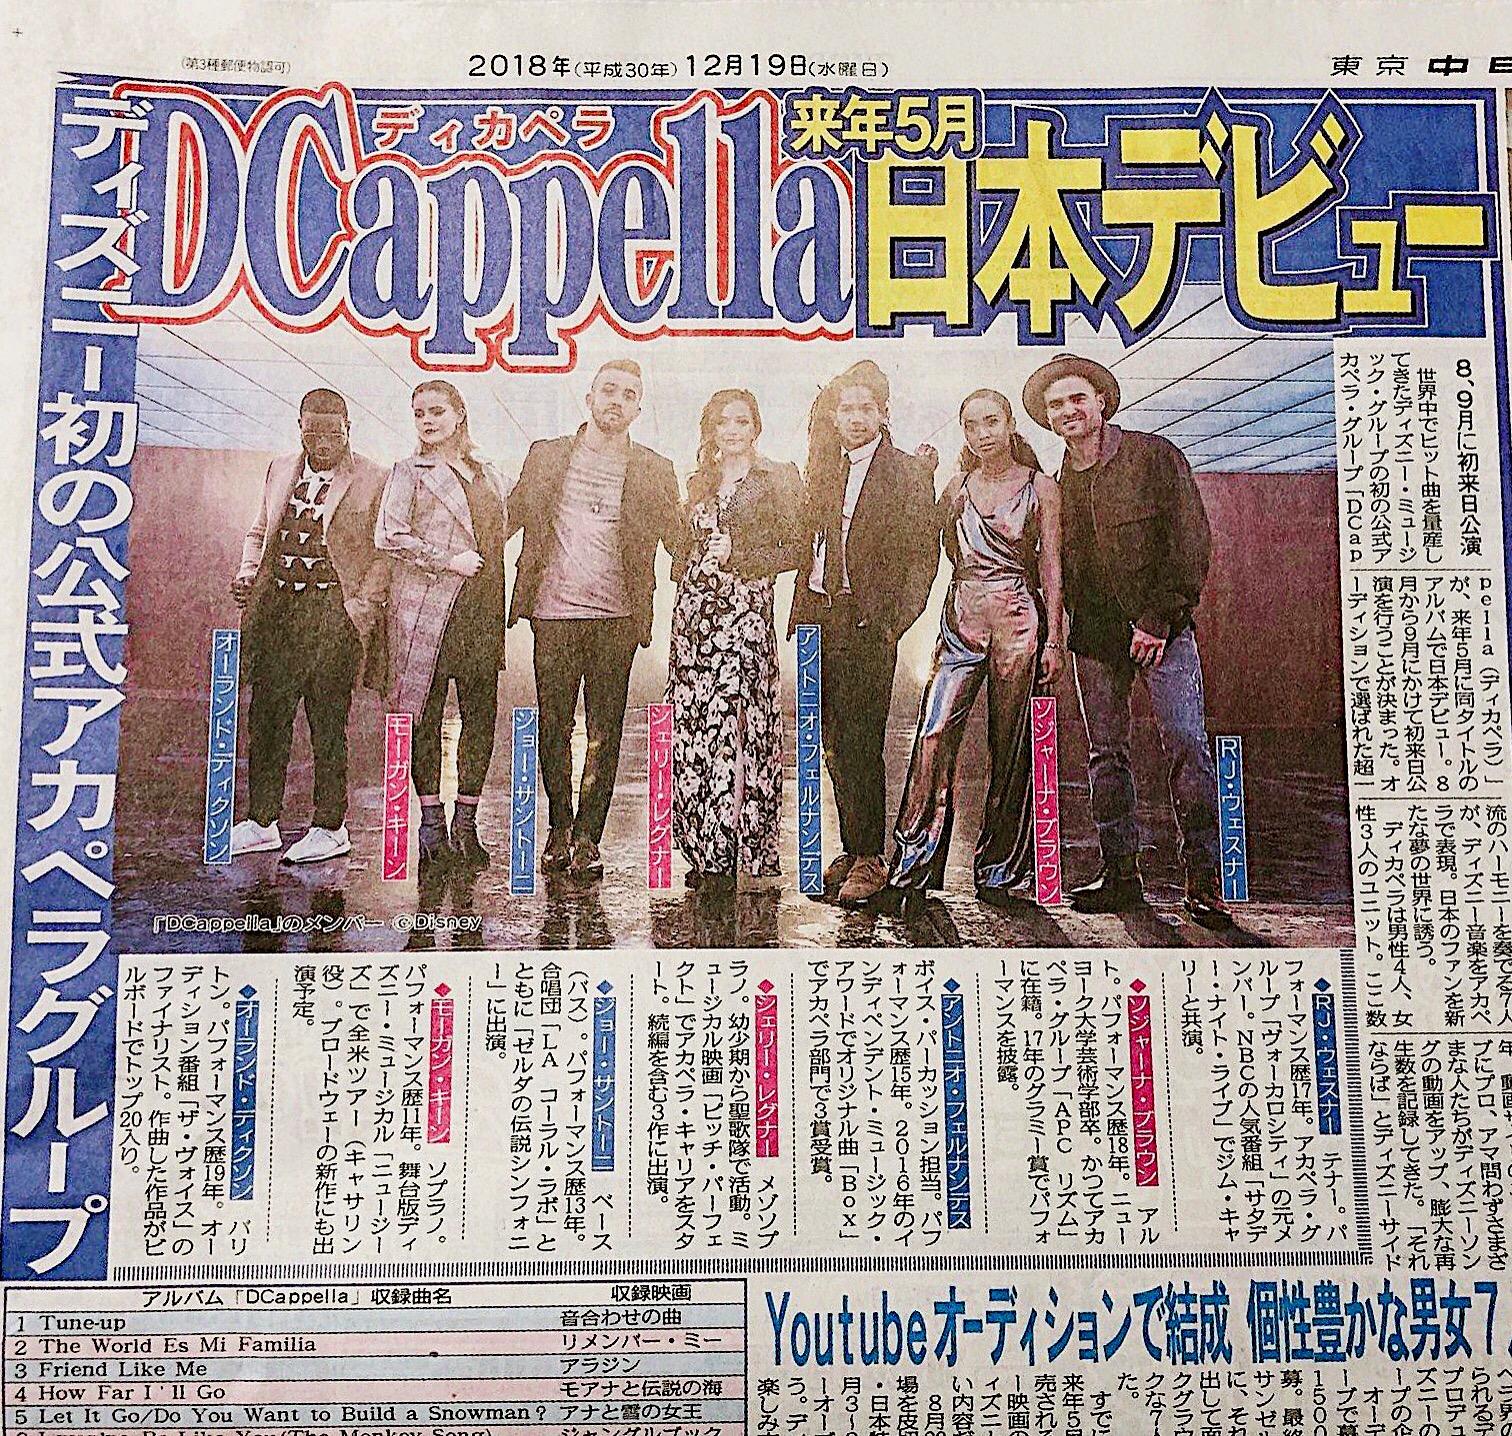 Via Japanese Newspaper